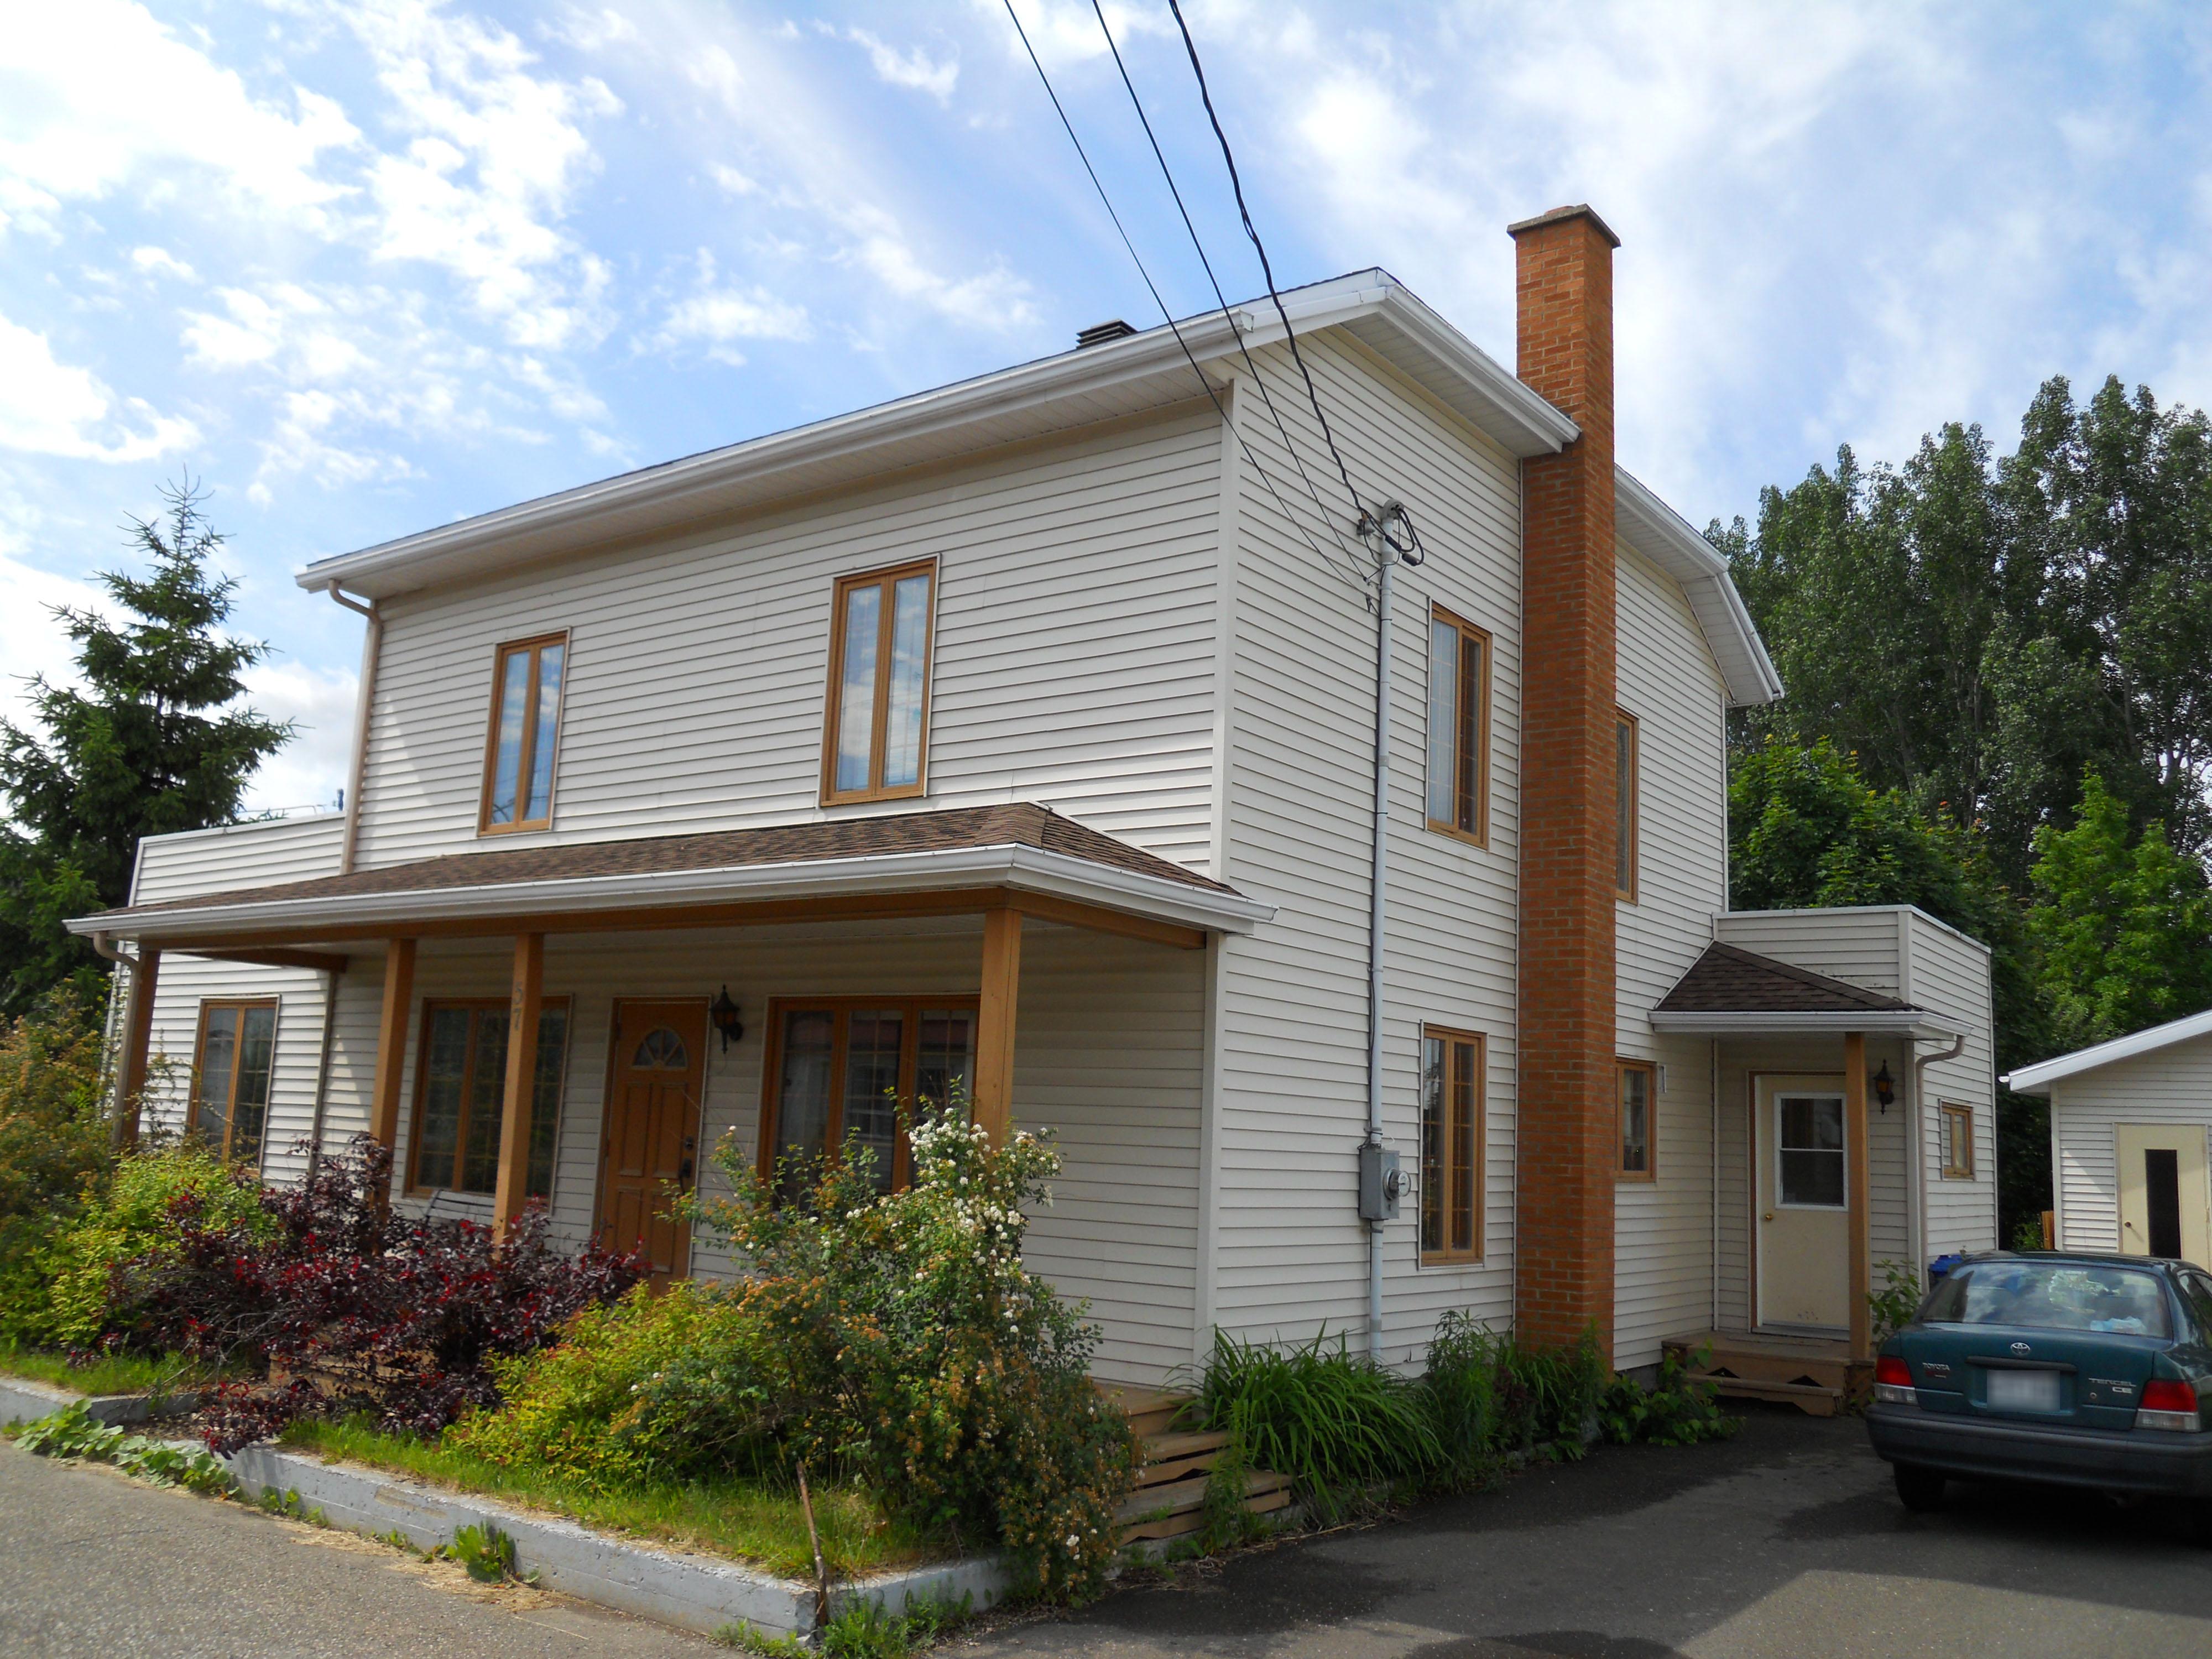 1831 - 57, rue de Verchères